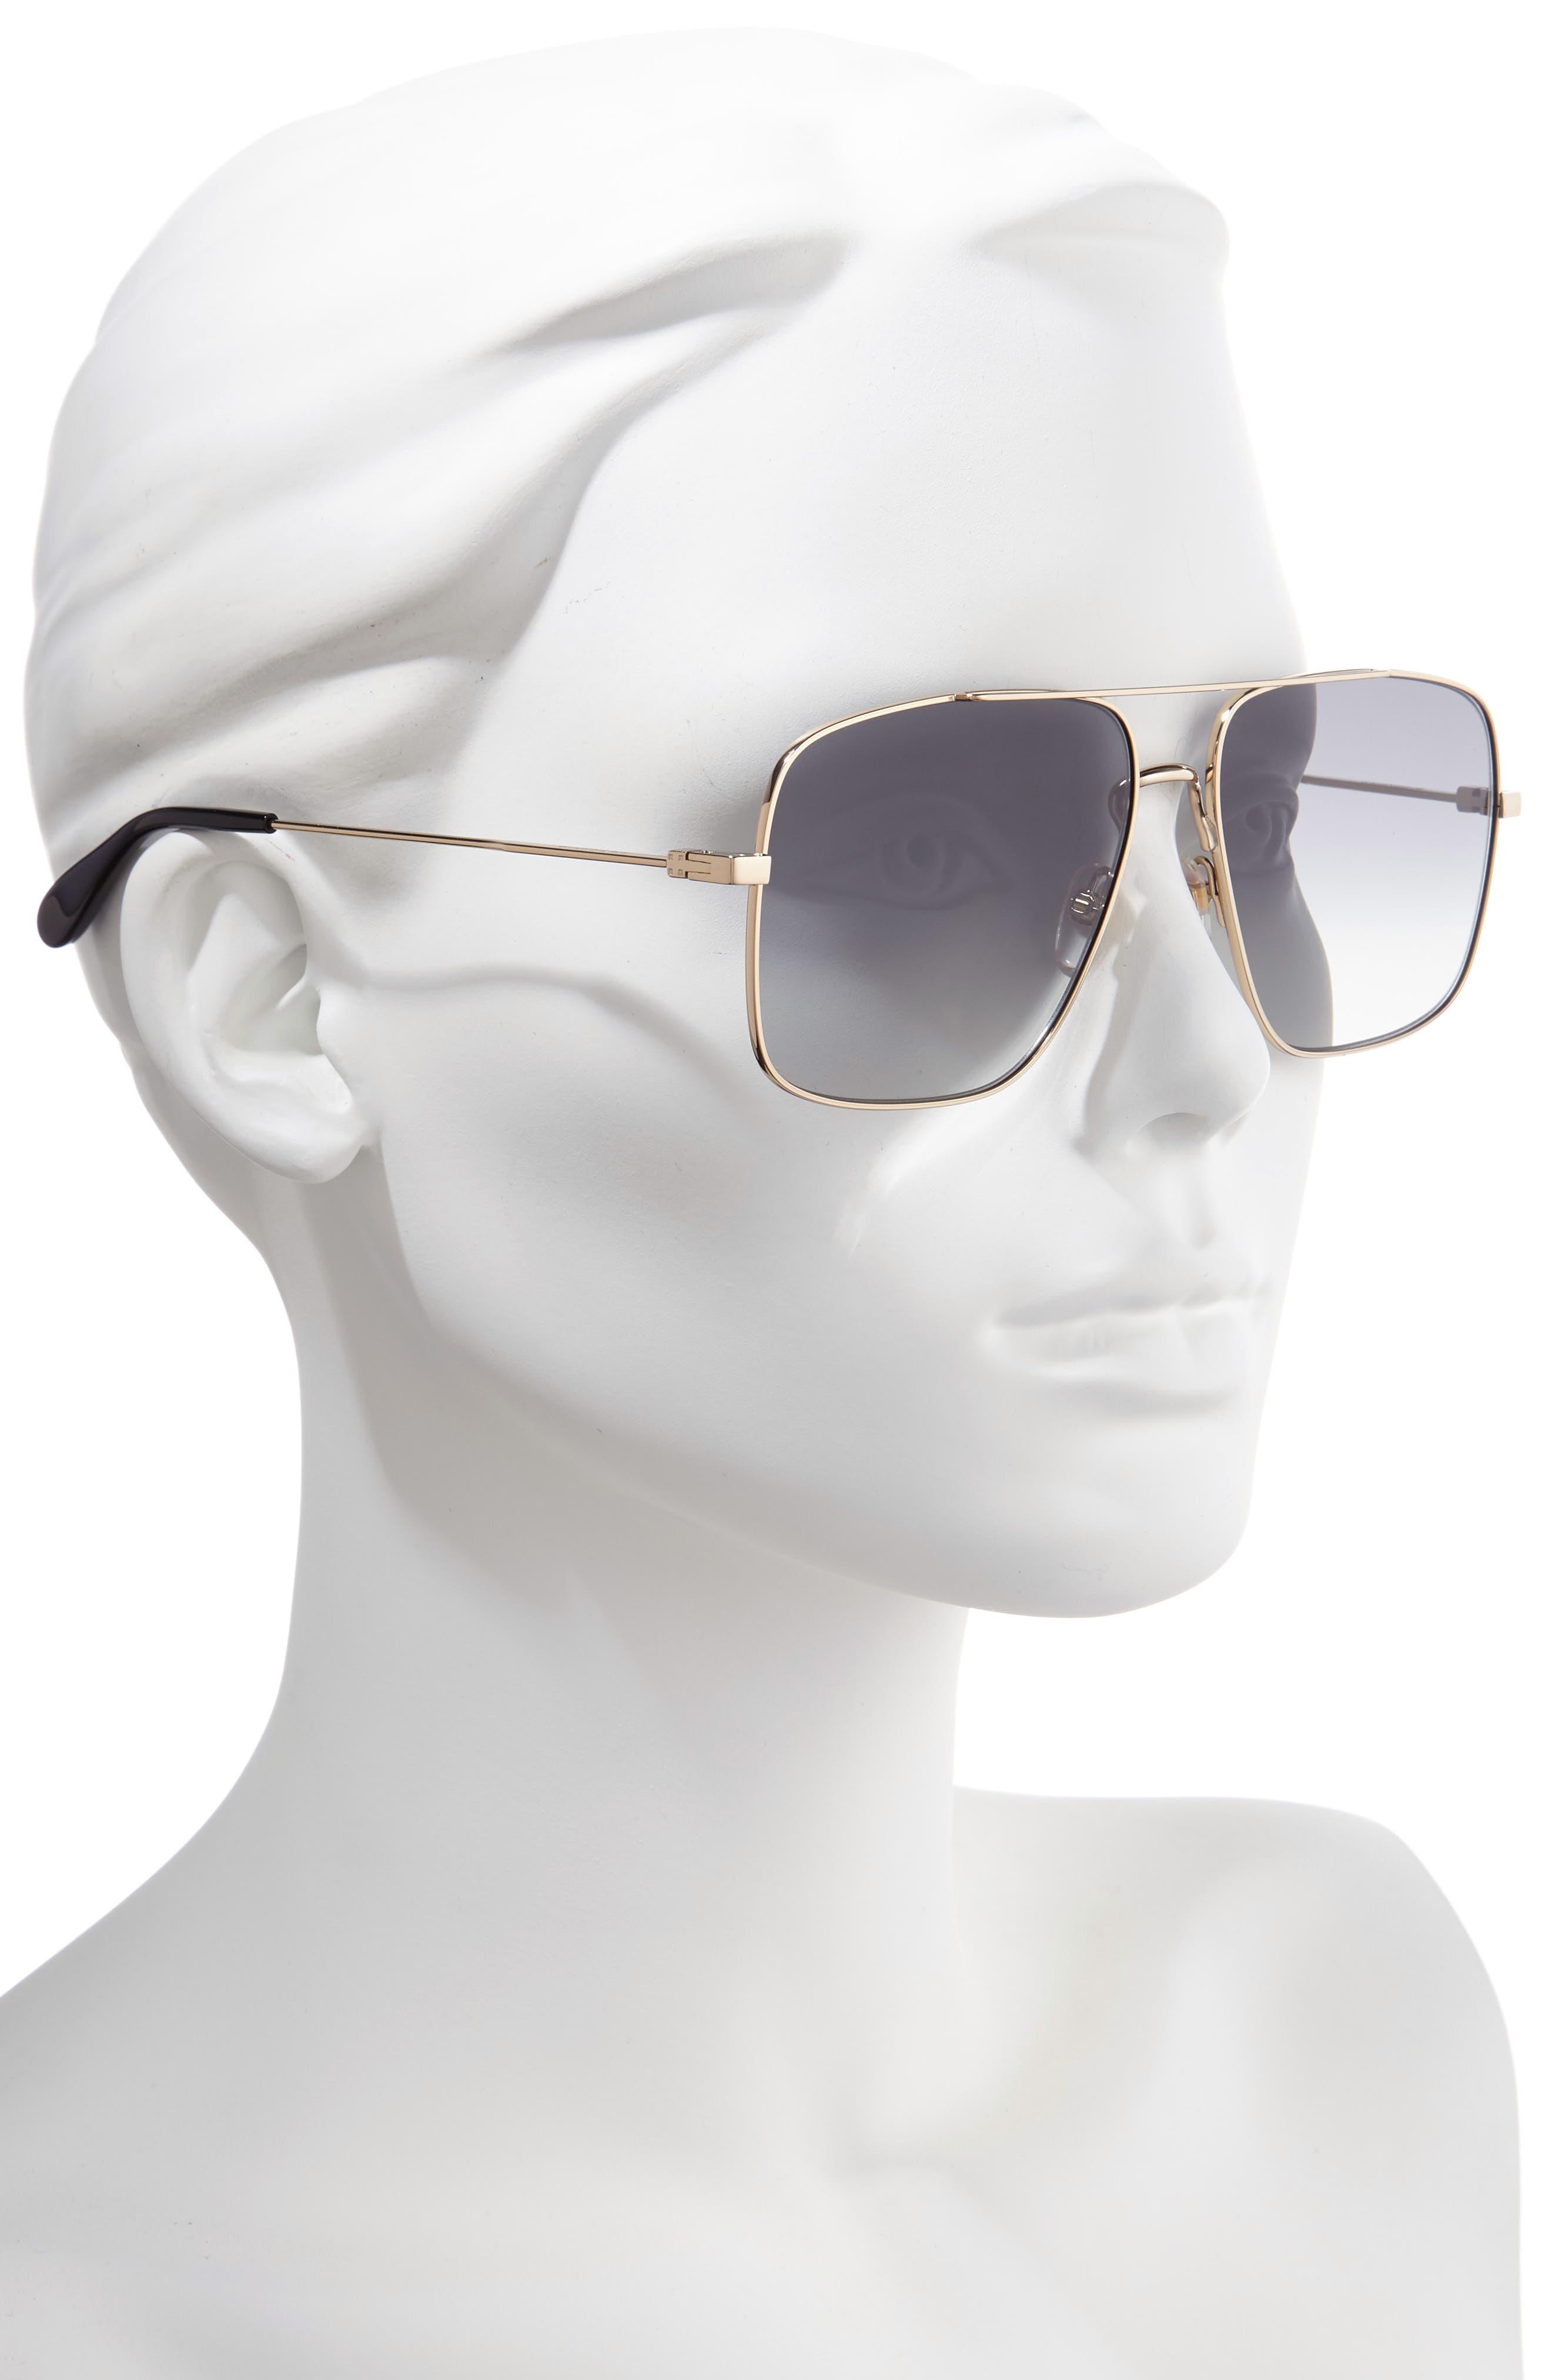 61mm Navigator Sunglasses,                             Alternate thumbnail 2, color,                             GOLD/ GREY